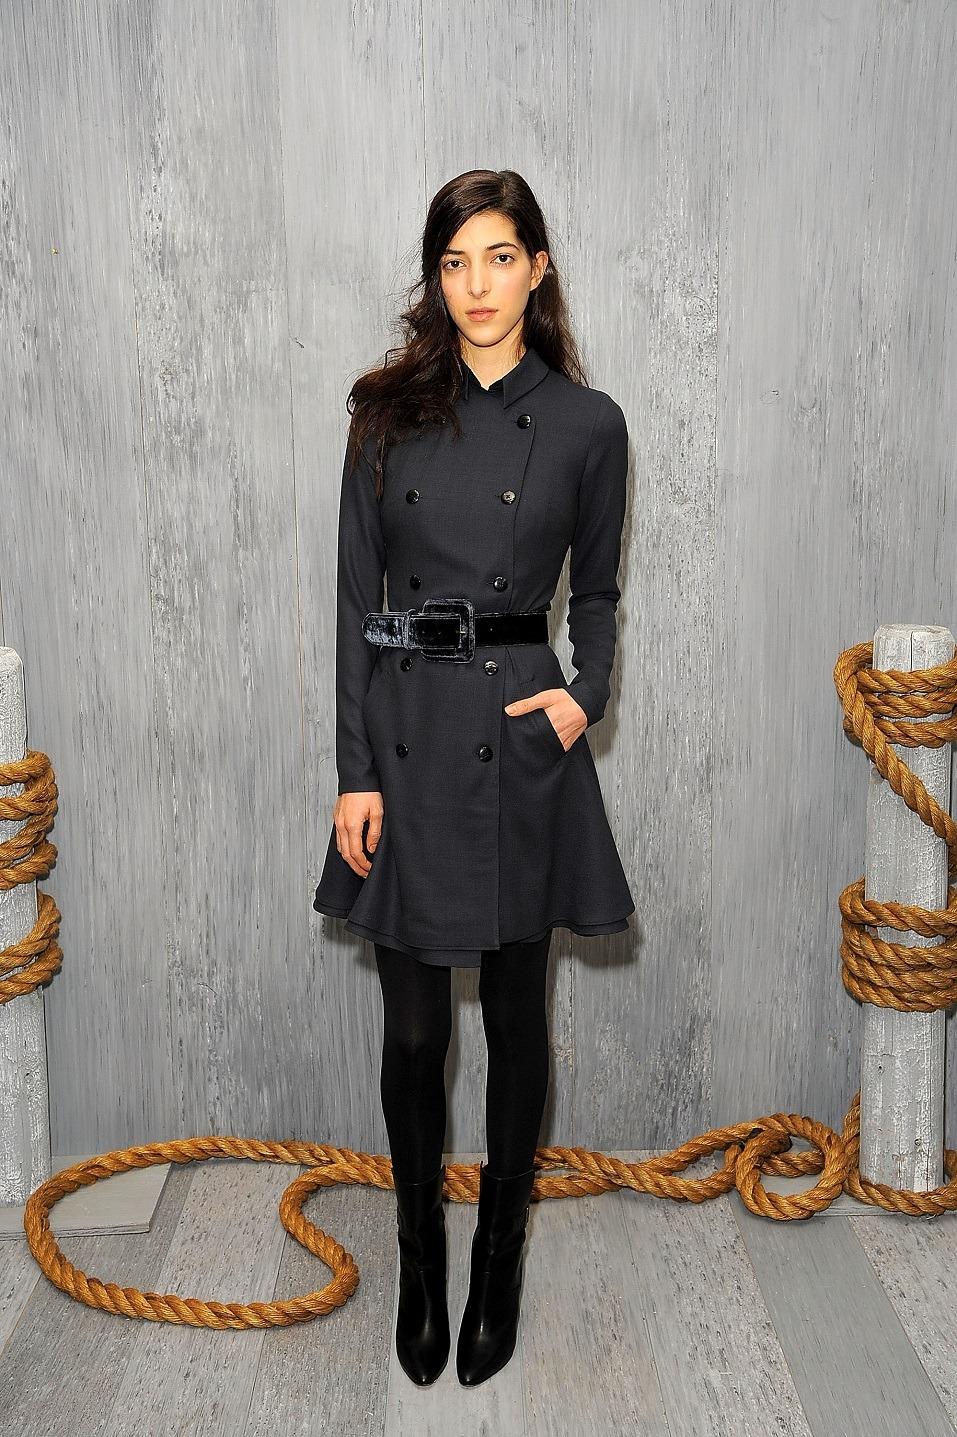 A model poses at the HANLEY MELLON Fall/Winter 2015 Collection Presentation